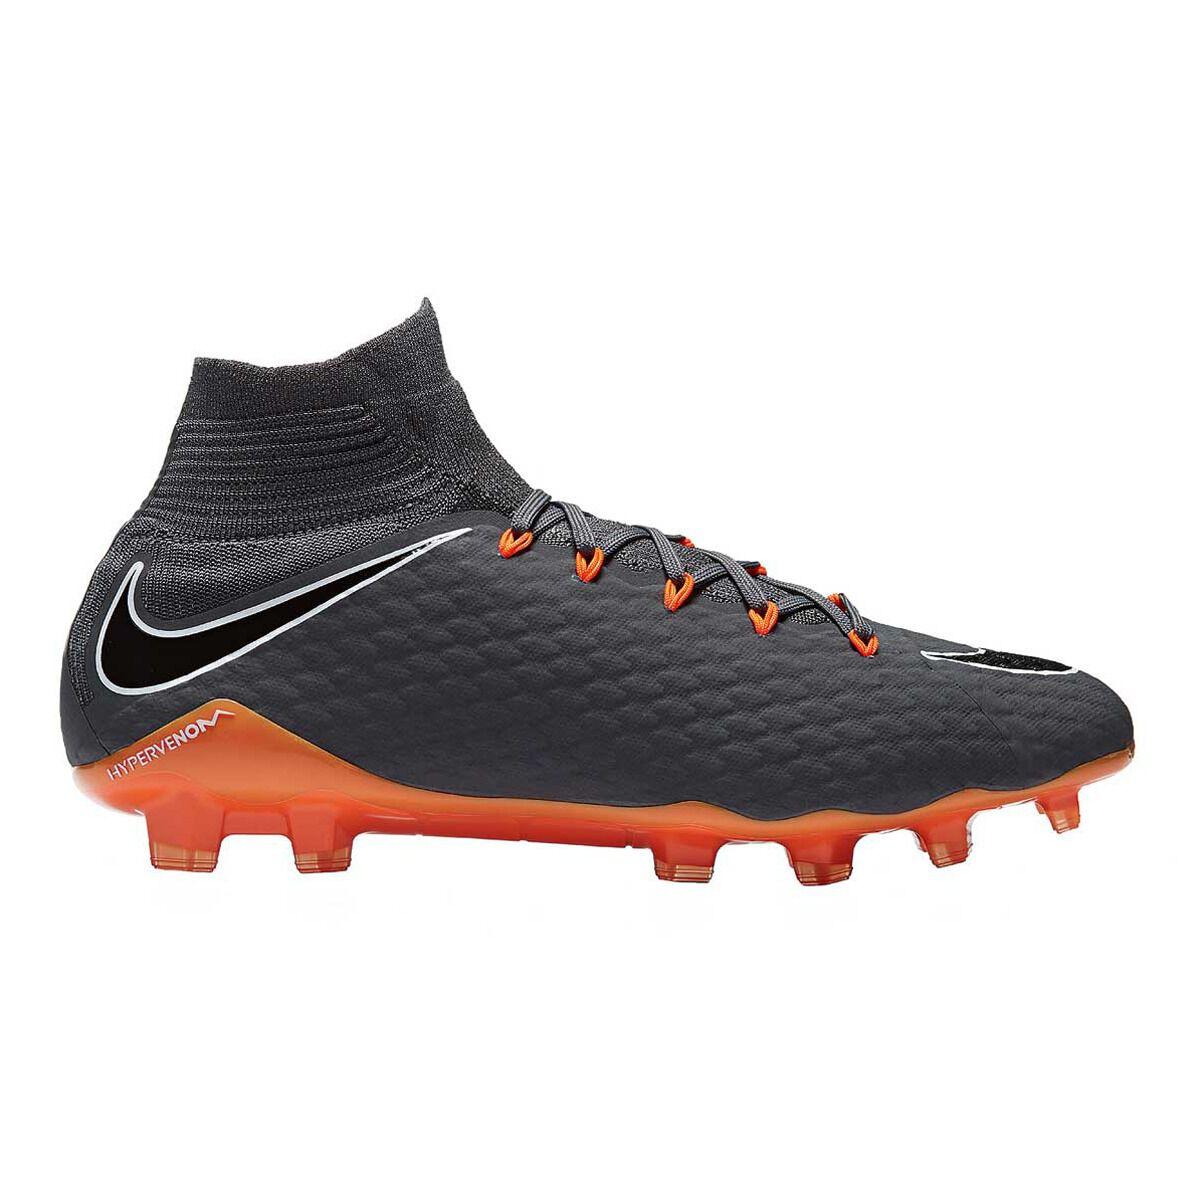 Buy United States Nike Soccer Shoes Men's Nike Hypervenom